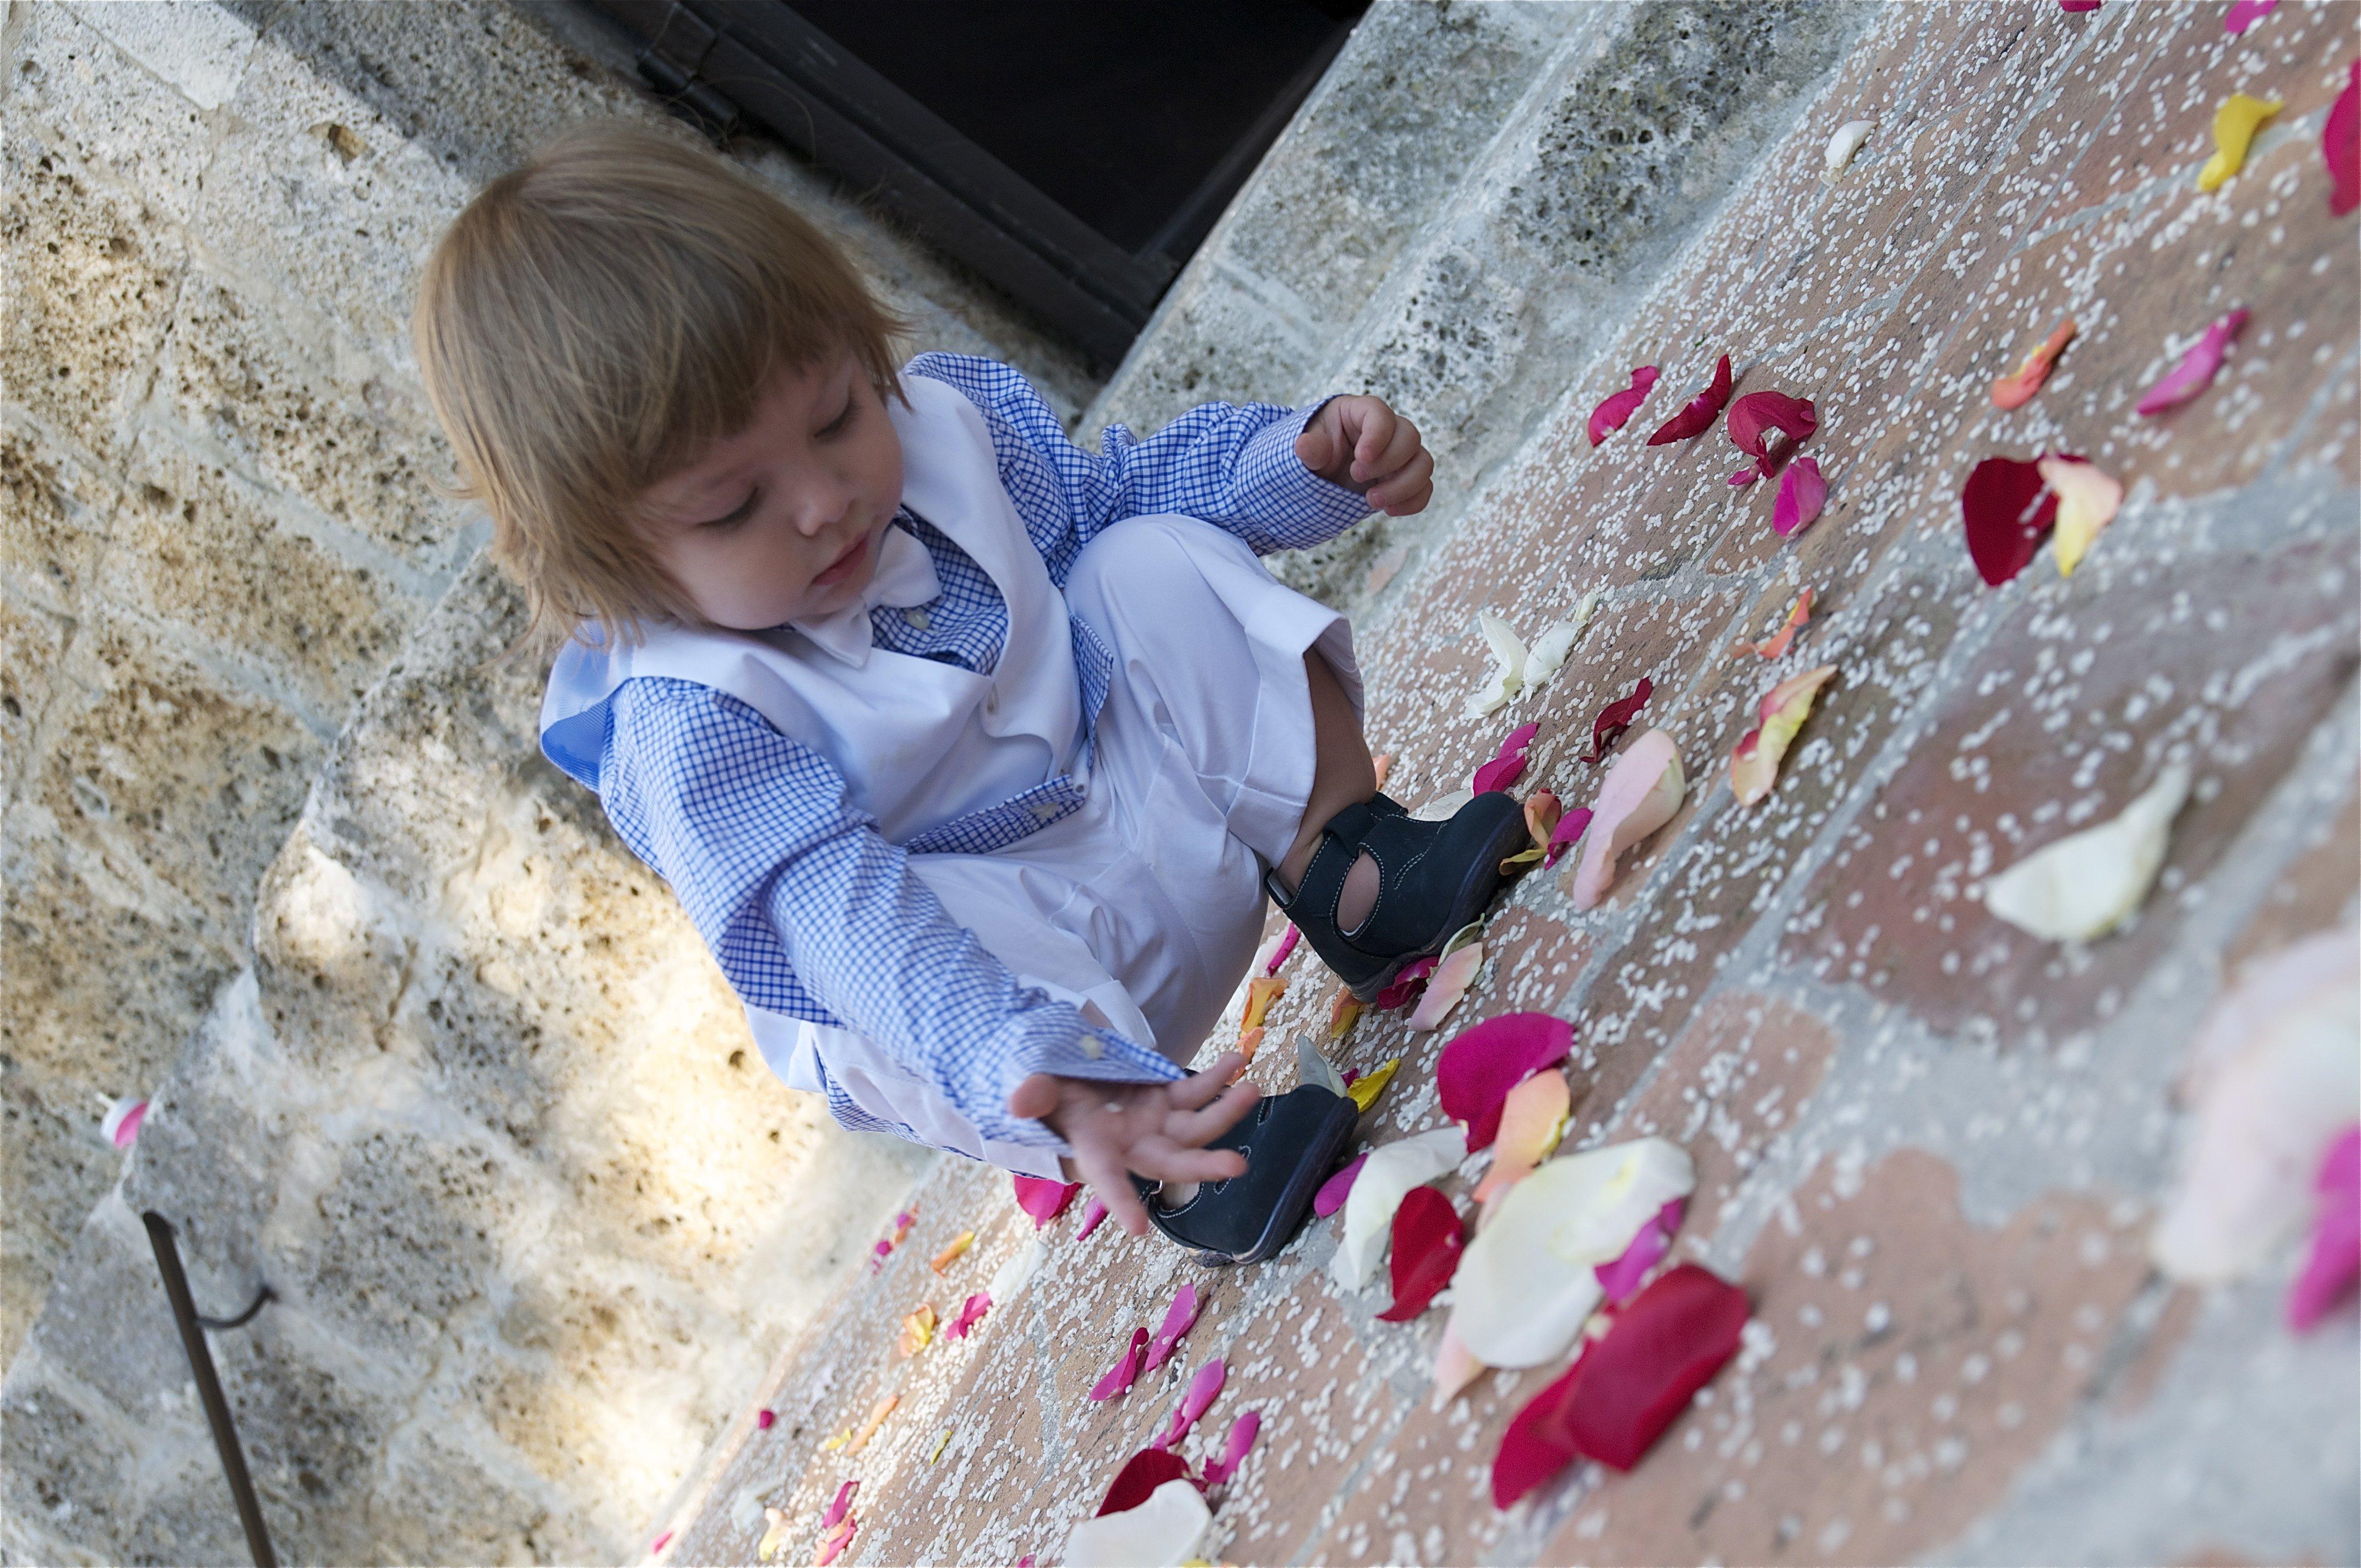 bambina raccoglie petali di rosa all'uscita di una chiesa